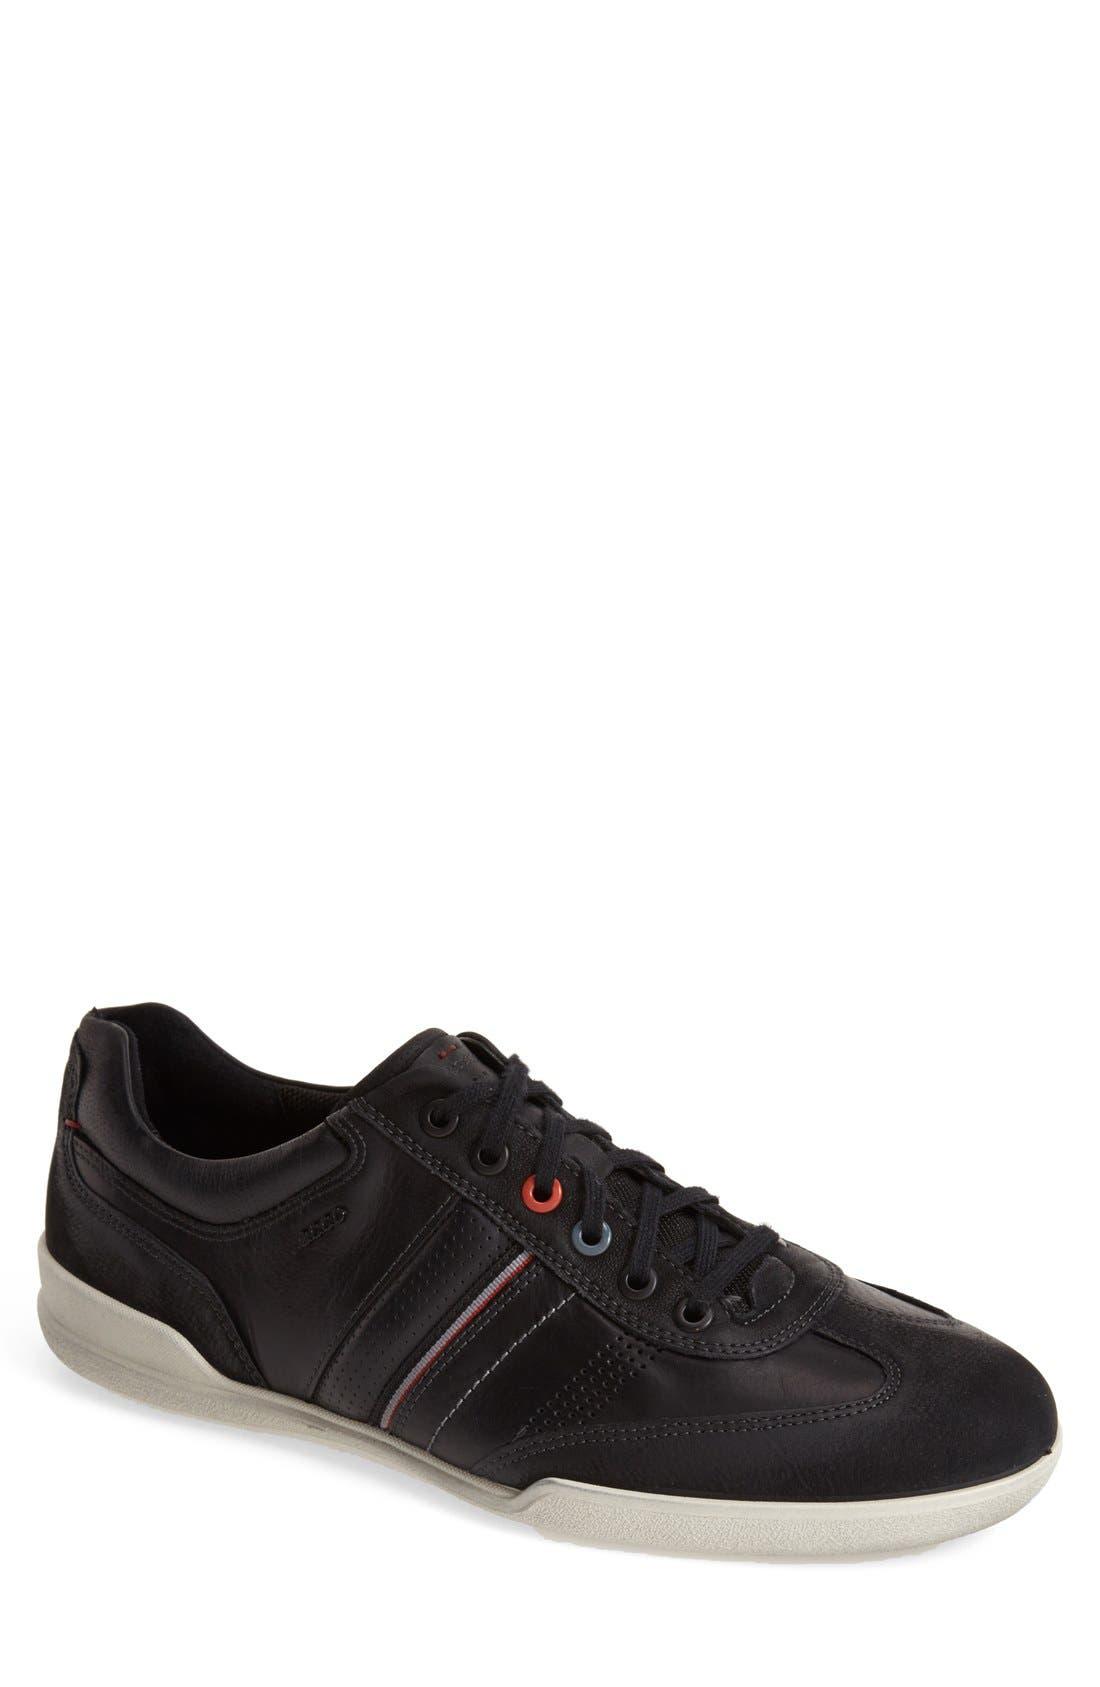 'Enrico' Sneaker,                         Main,                         color, 001